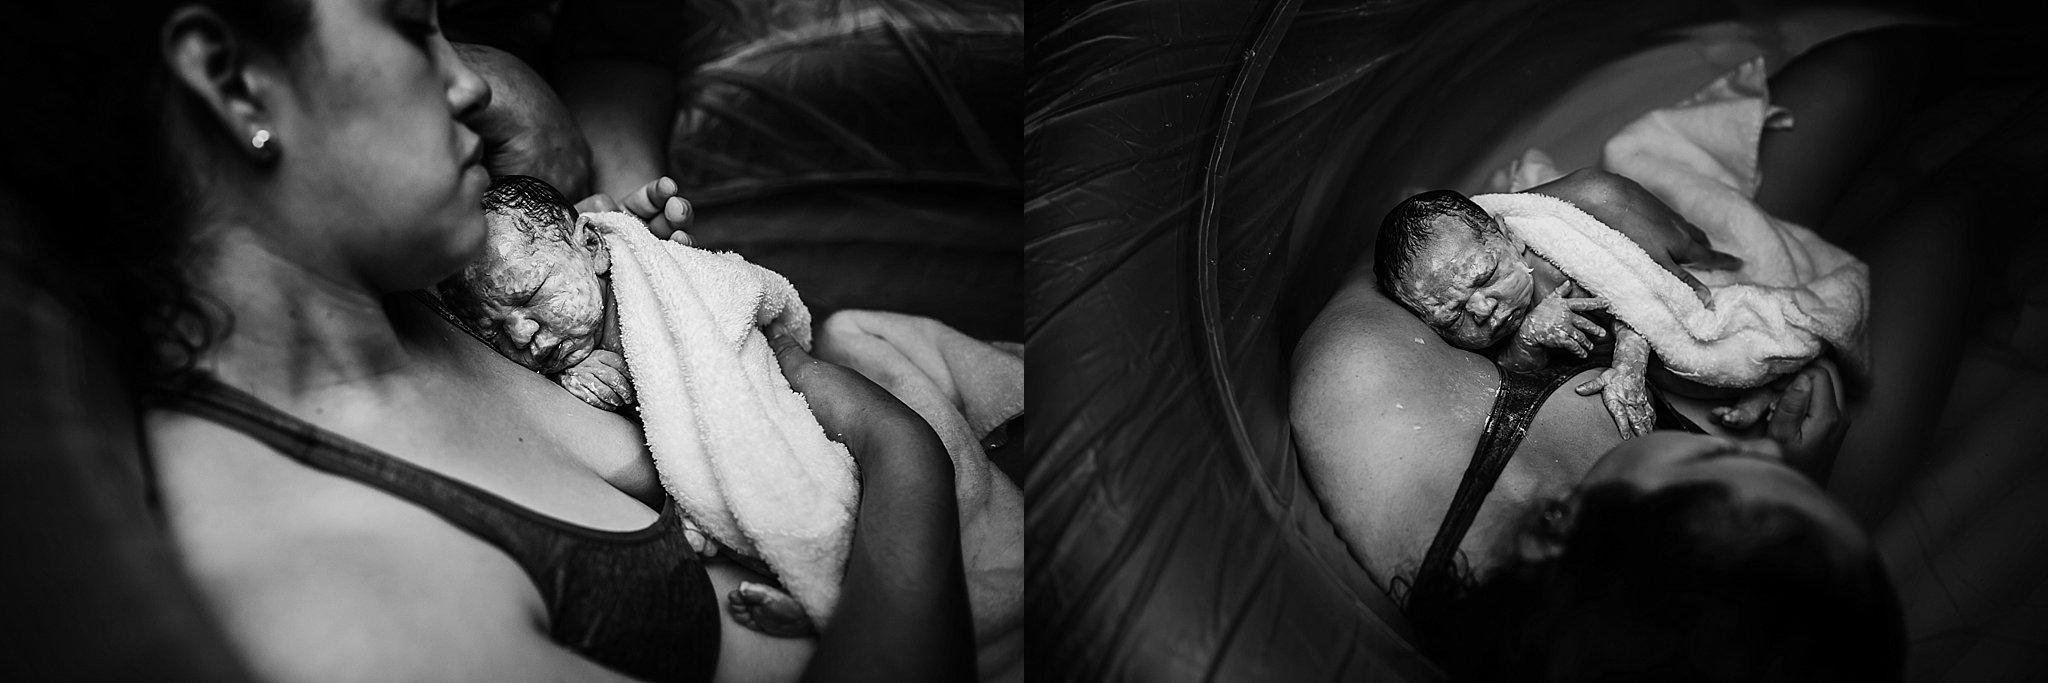 Gianna-San-Antonio-Birth-Photographer-42_WEB.jpg